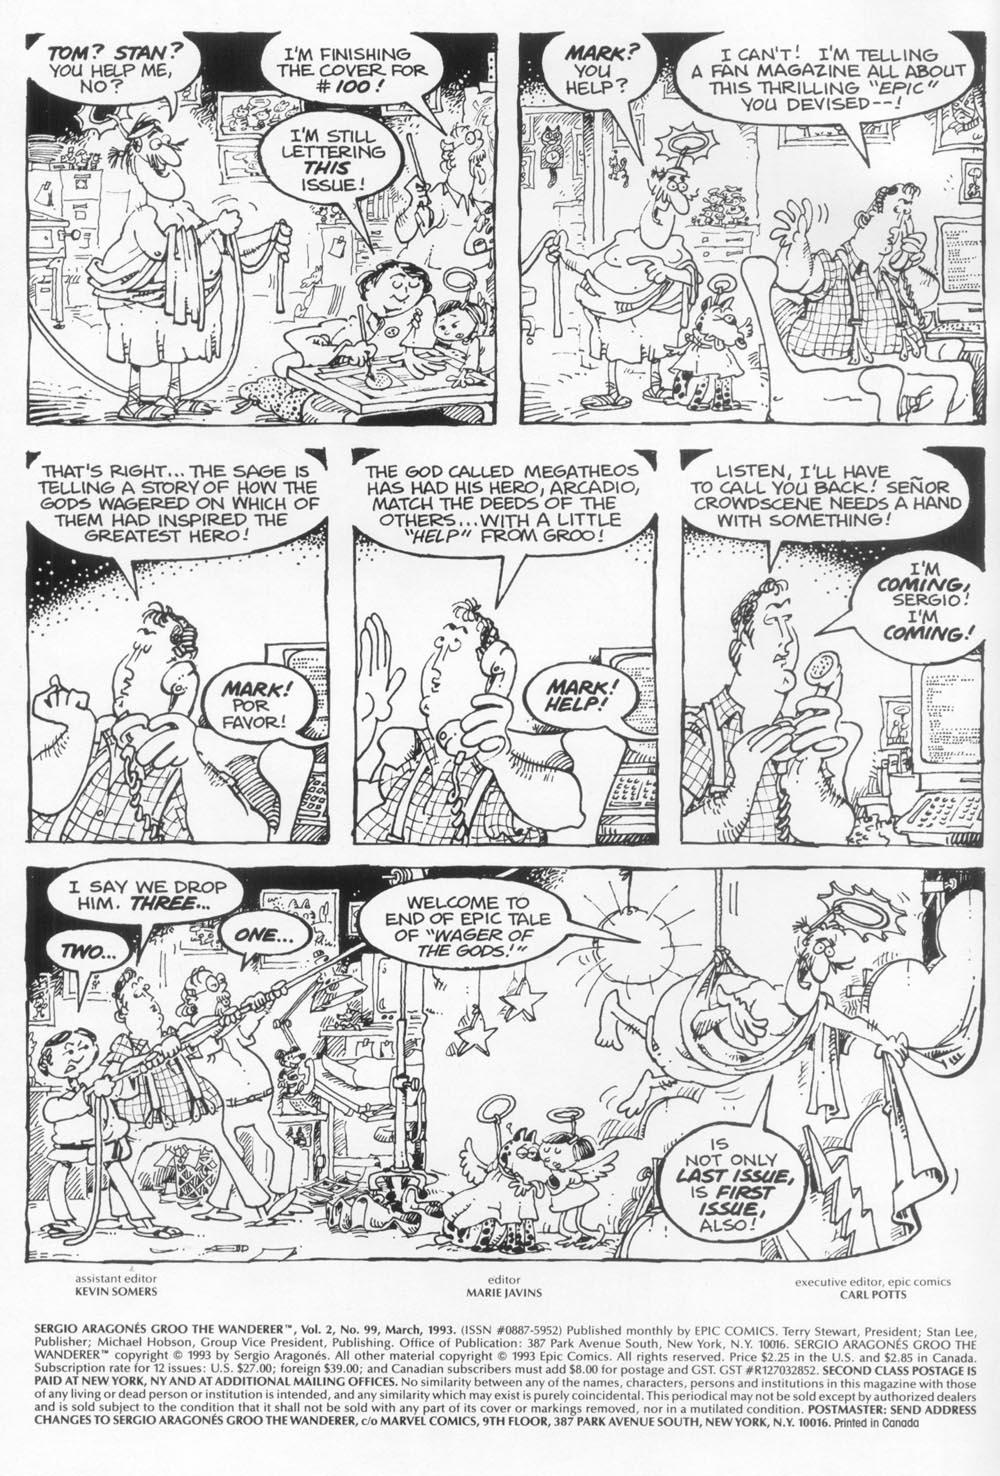 Read online Sergio Aragonés Groo the Wanderer comic -  Issue #99 - 2